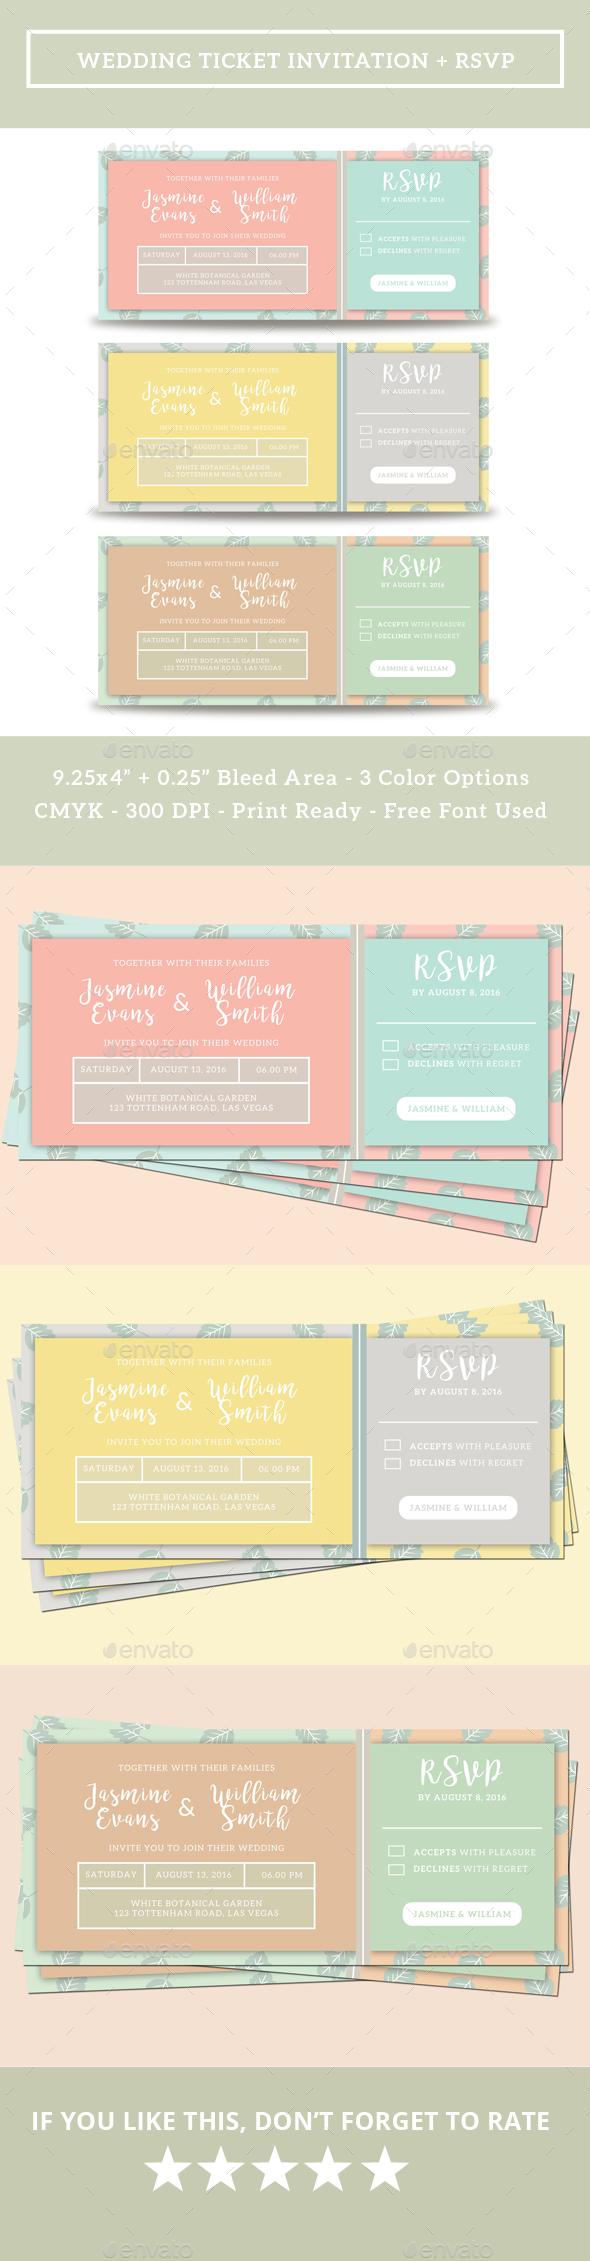 Wedding Ticket Invitation + RSVP